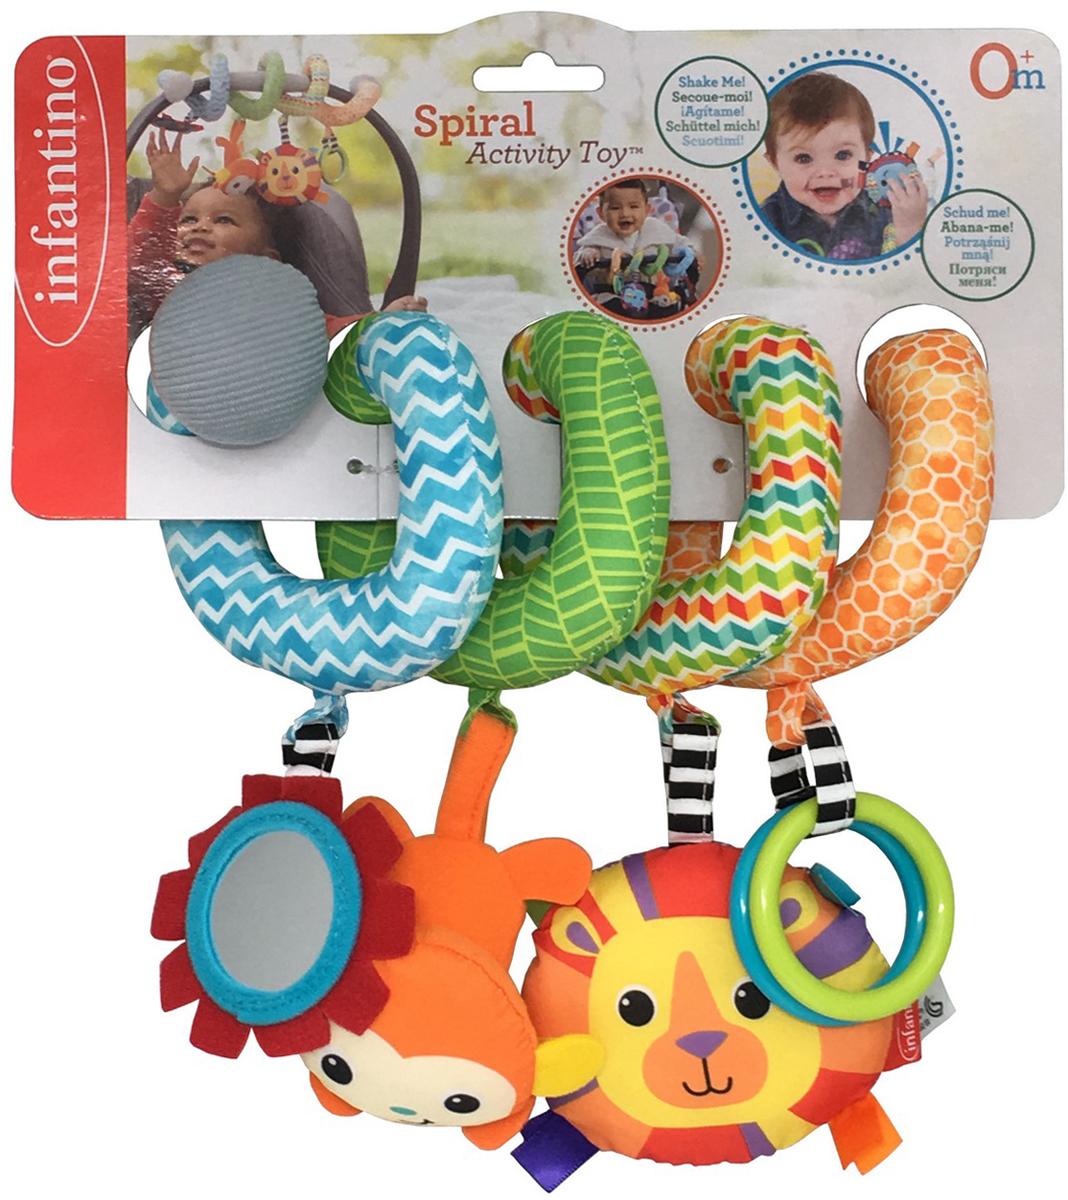 Infantino Развивающая игрушка Спиралька развивающая игрушка infantino коровка 506 845